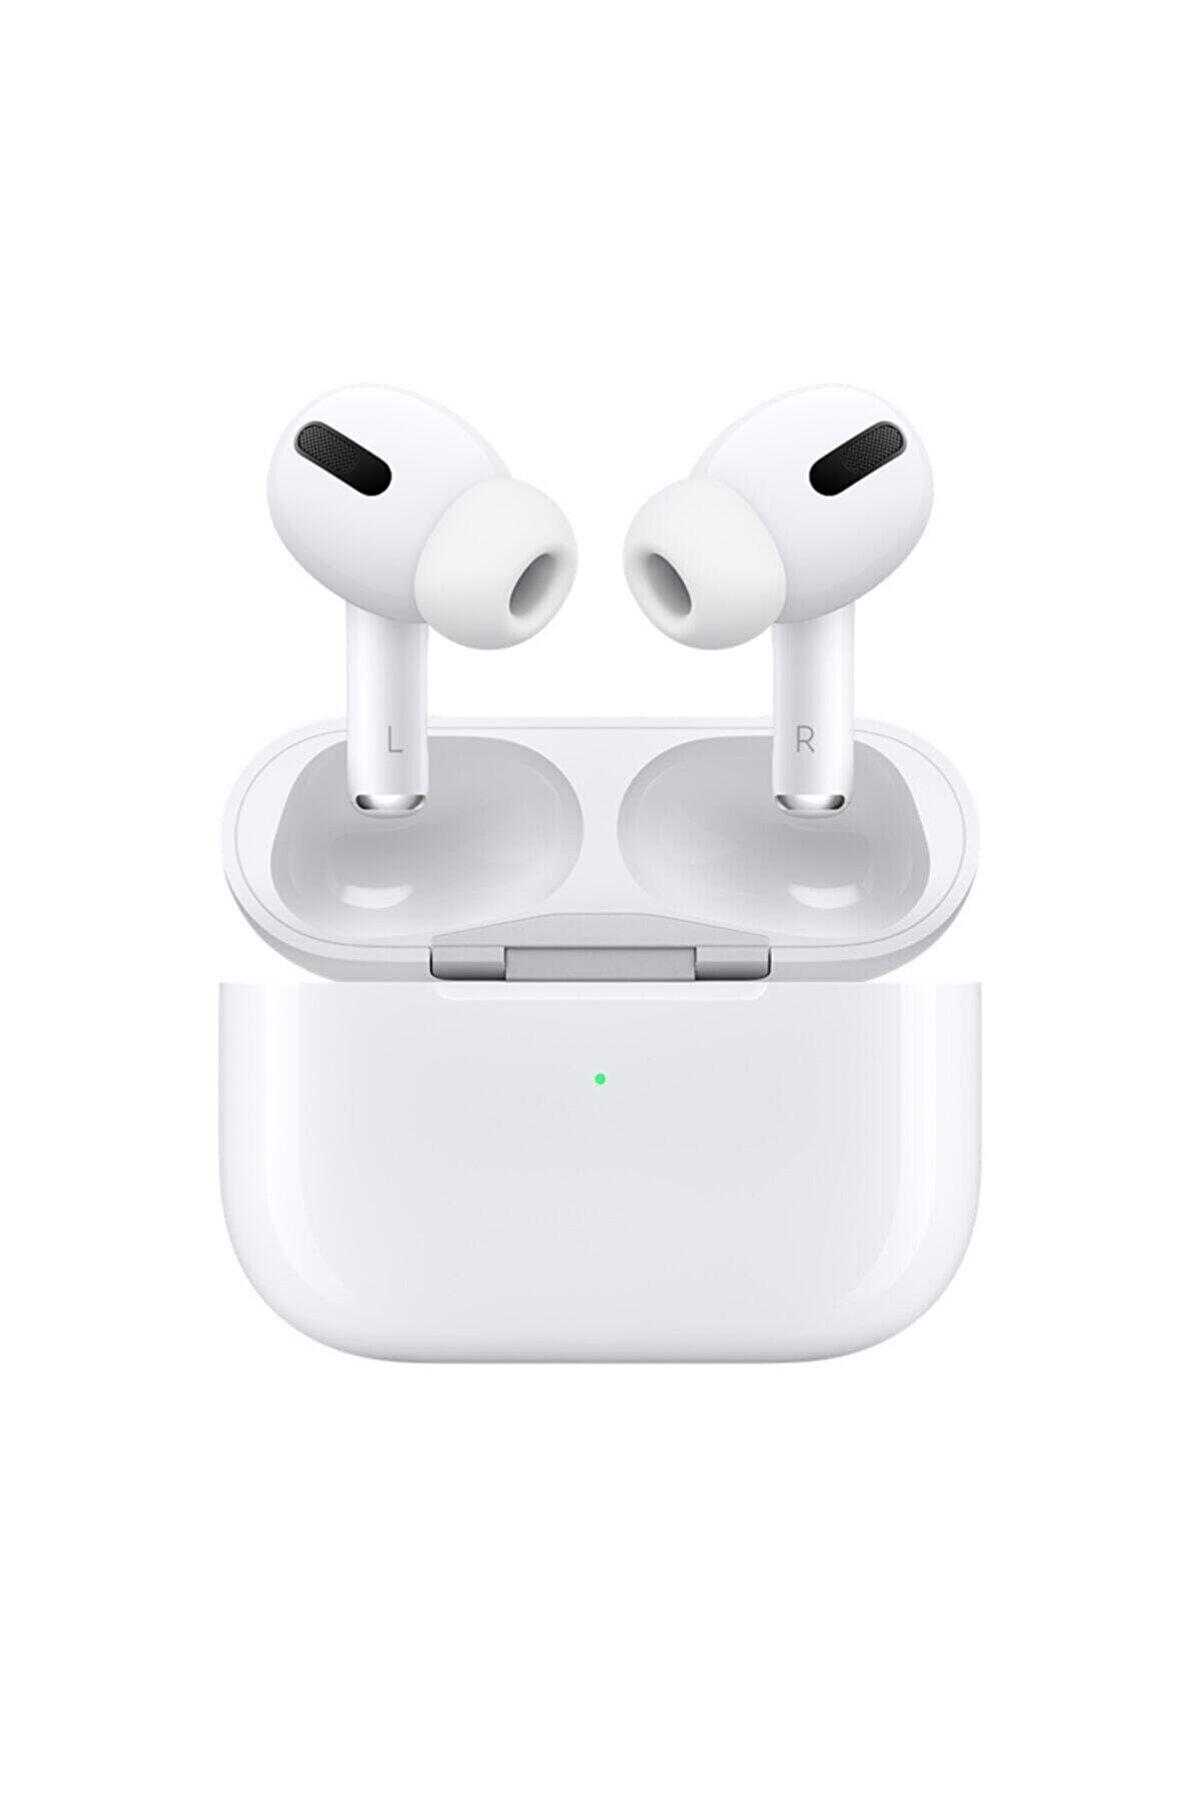 emybox Powerway Btx99 Airpodspropods Stereo Çift Taraflı Yüksek Ses Uzun Pil Ömrü Bluetooth Kulaklık Beyaz